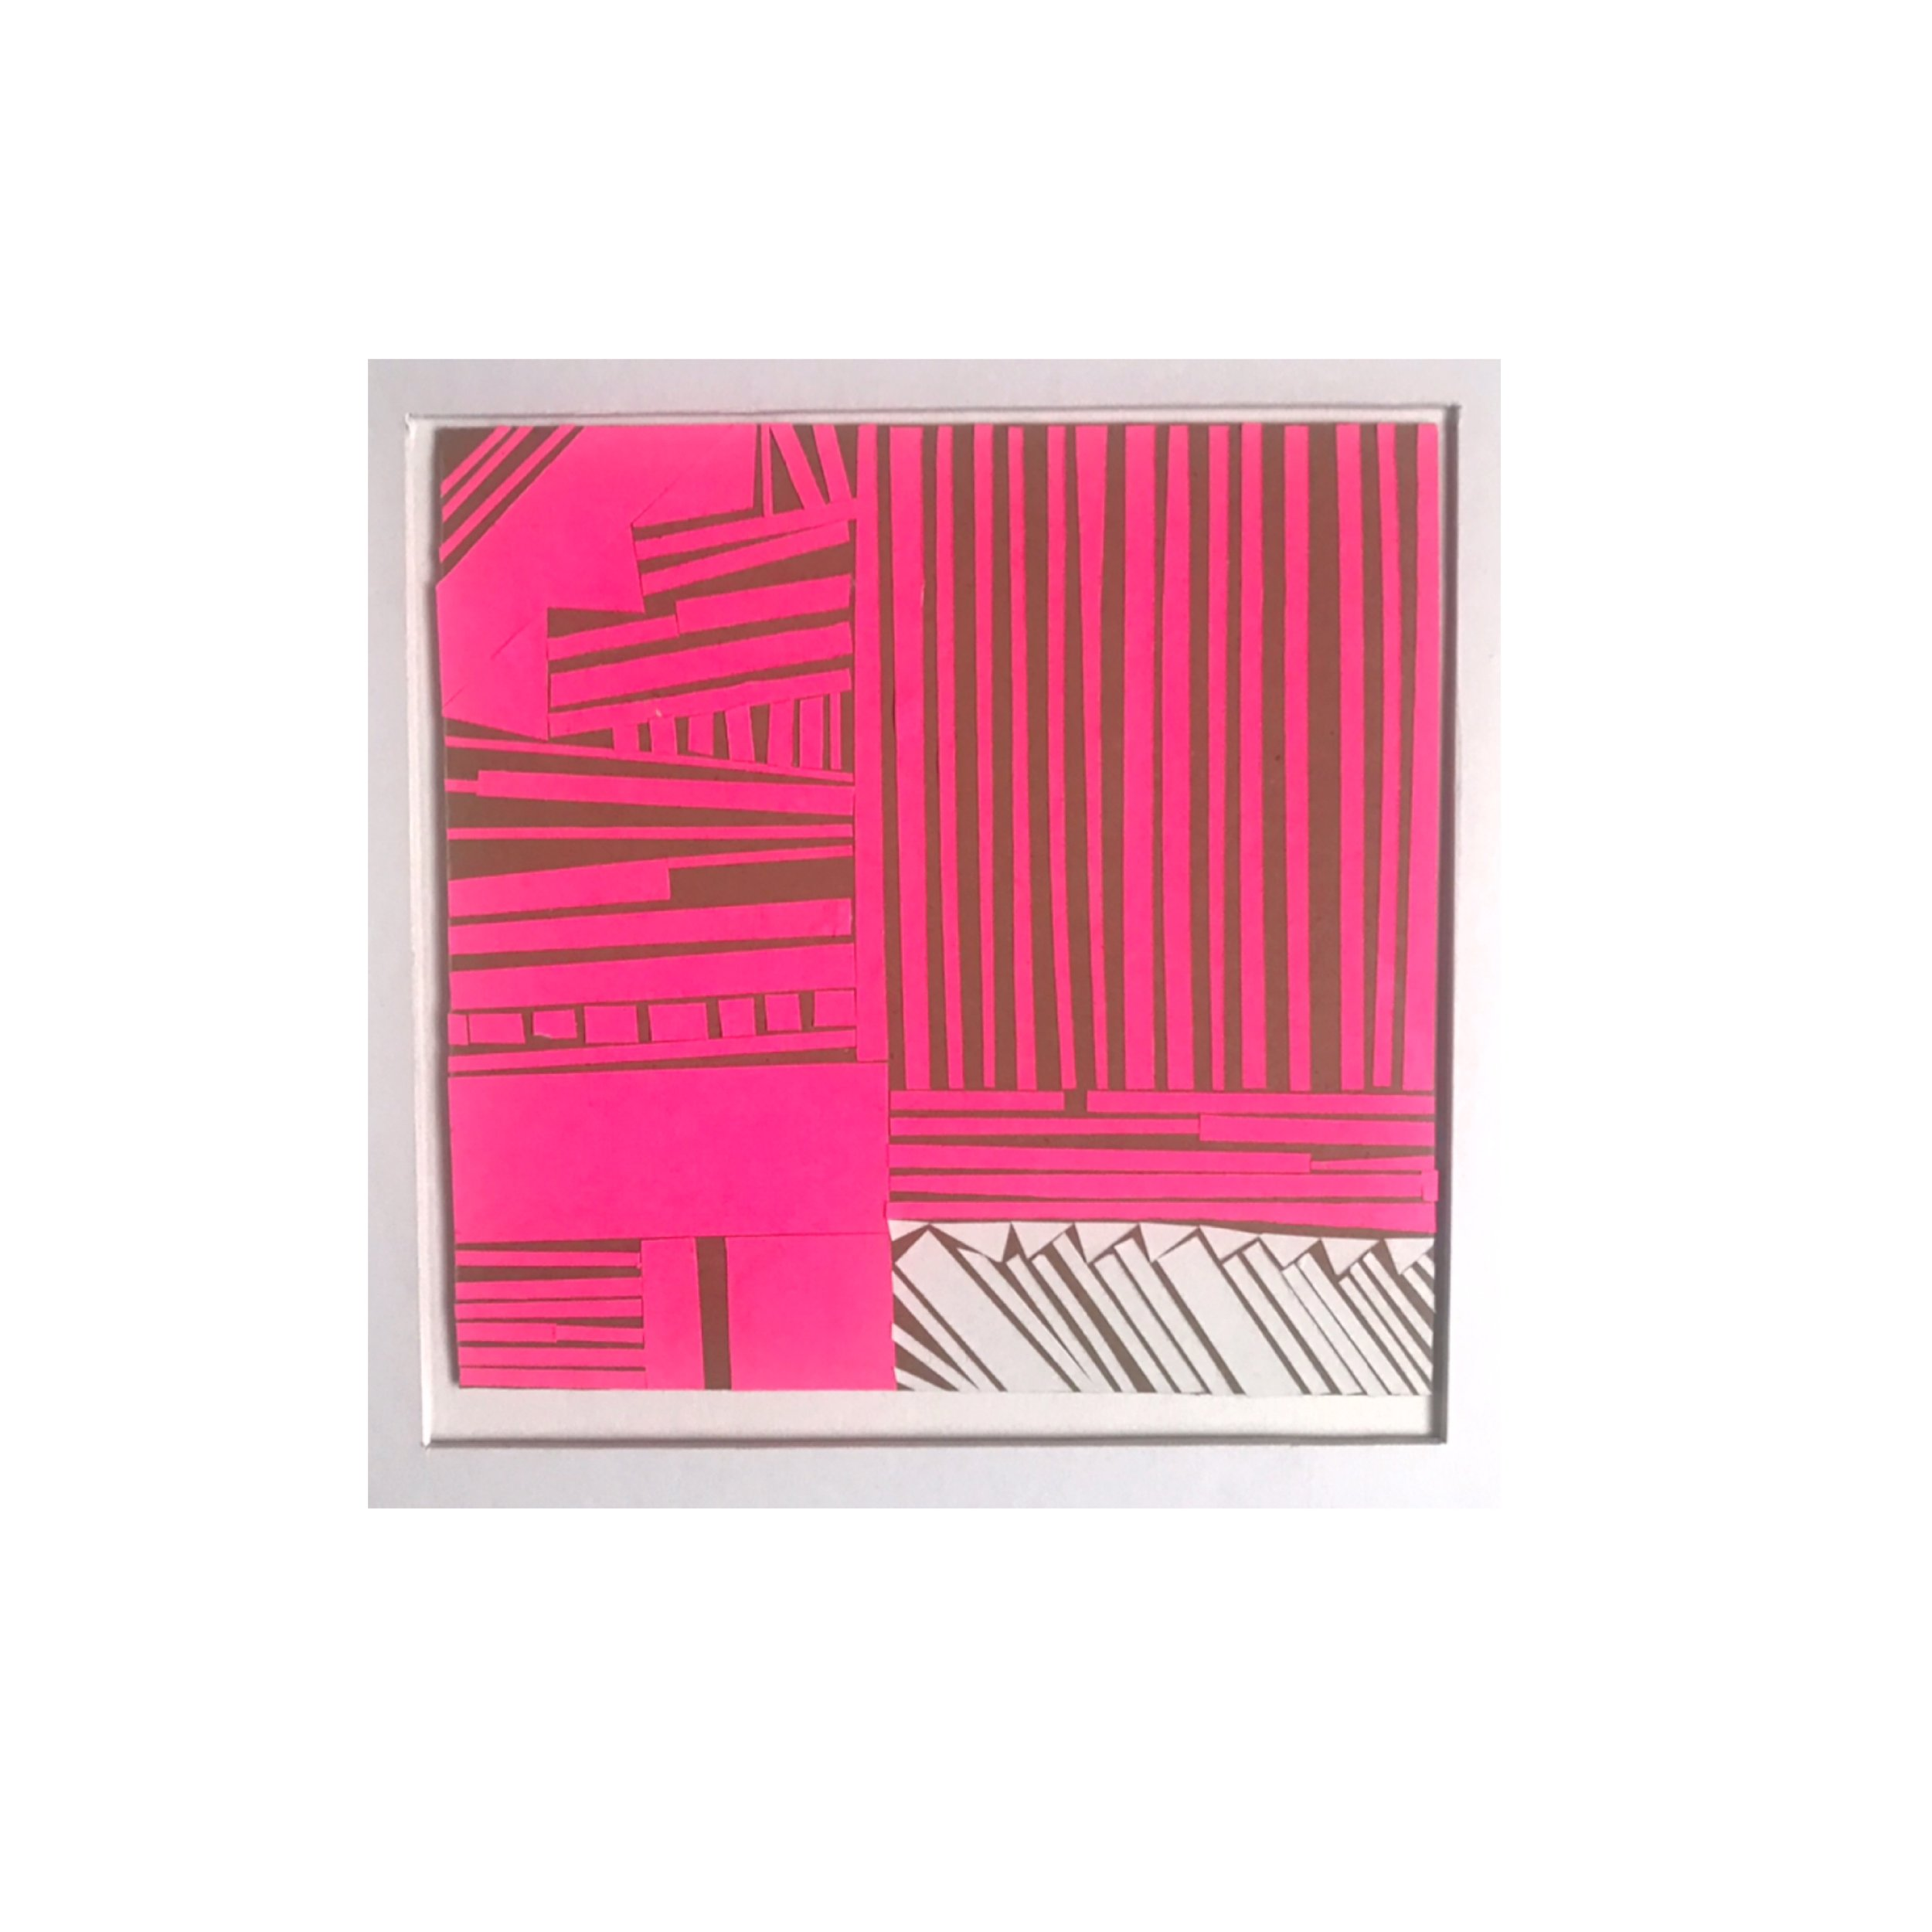 albumtemp-2 copy 68.JPG